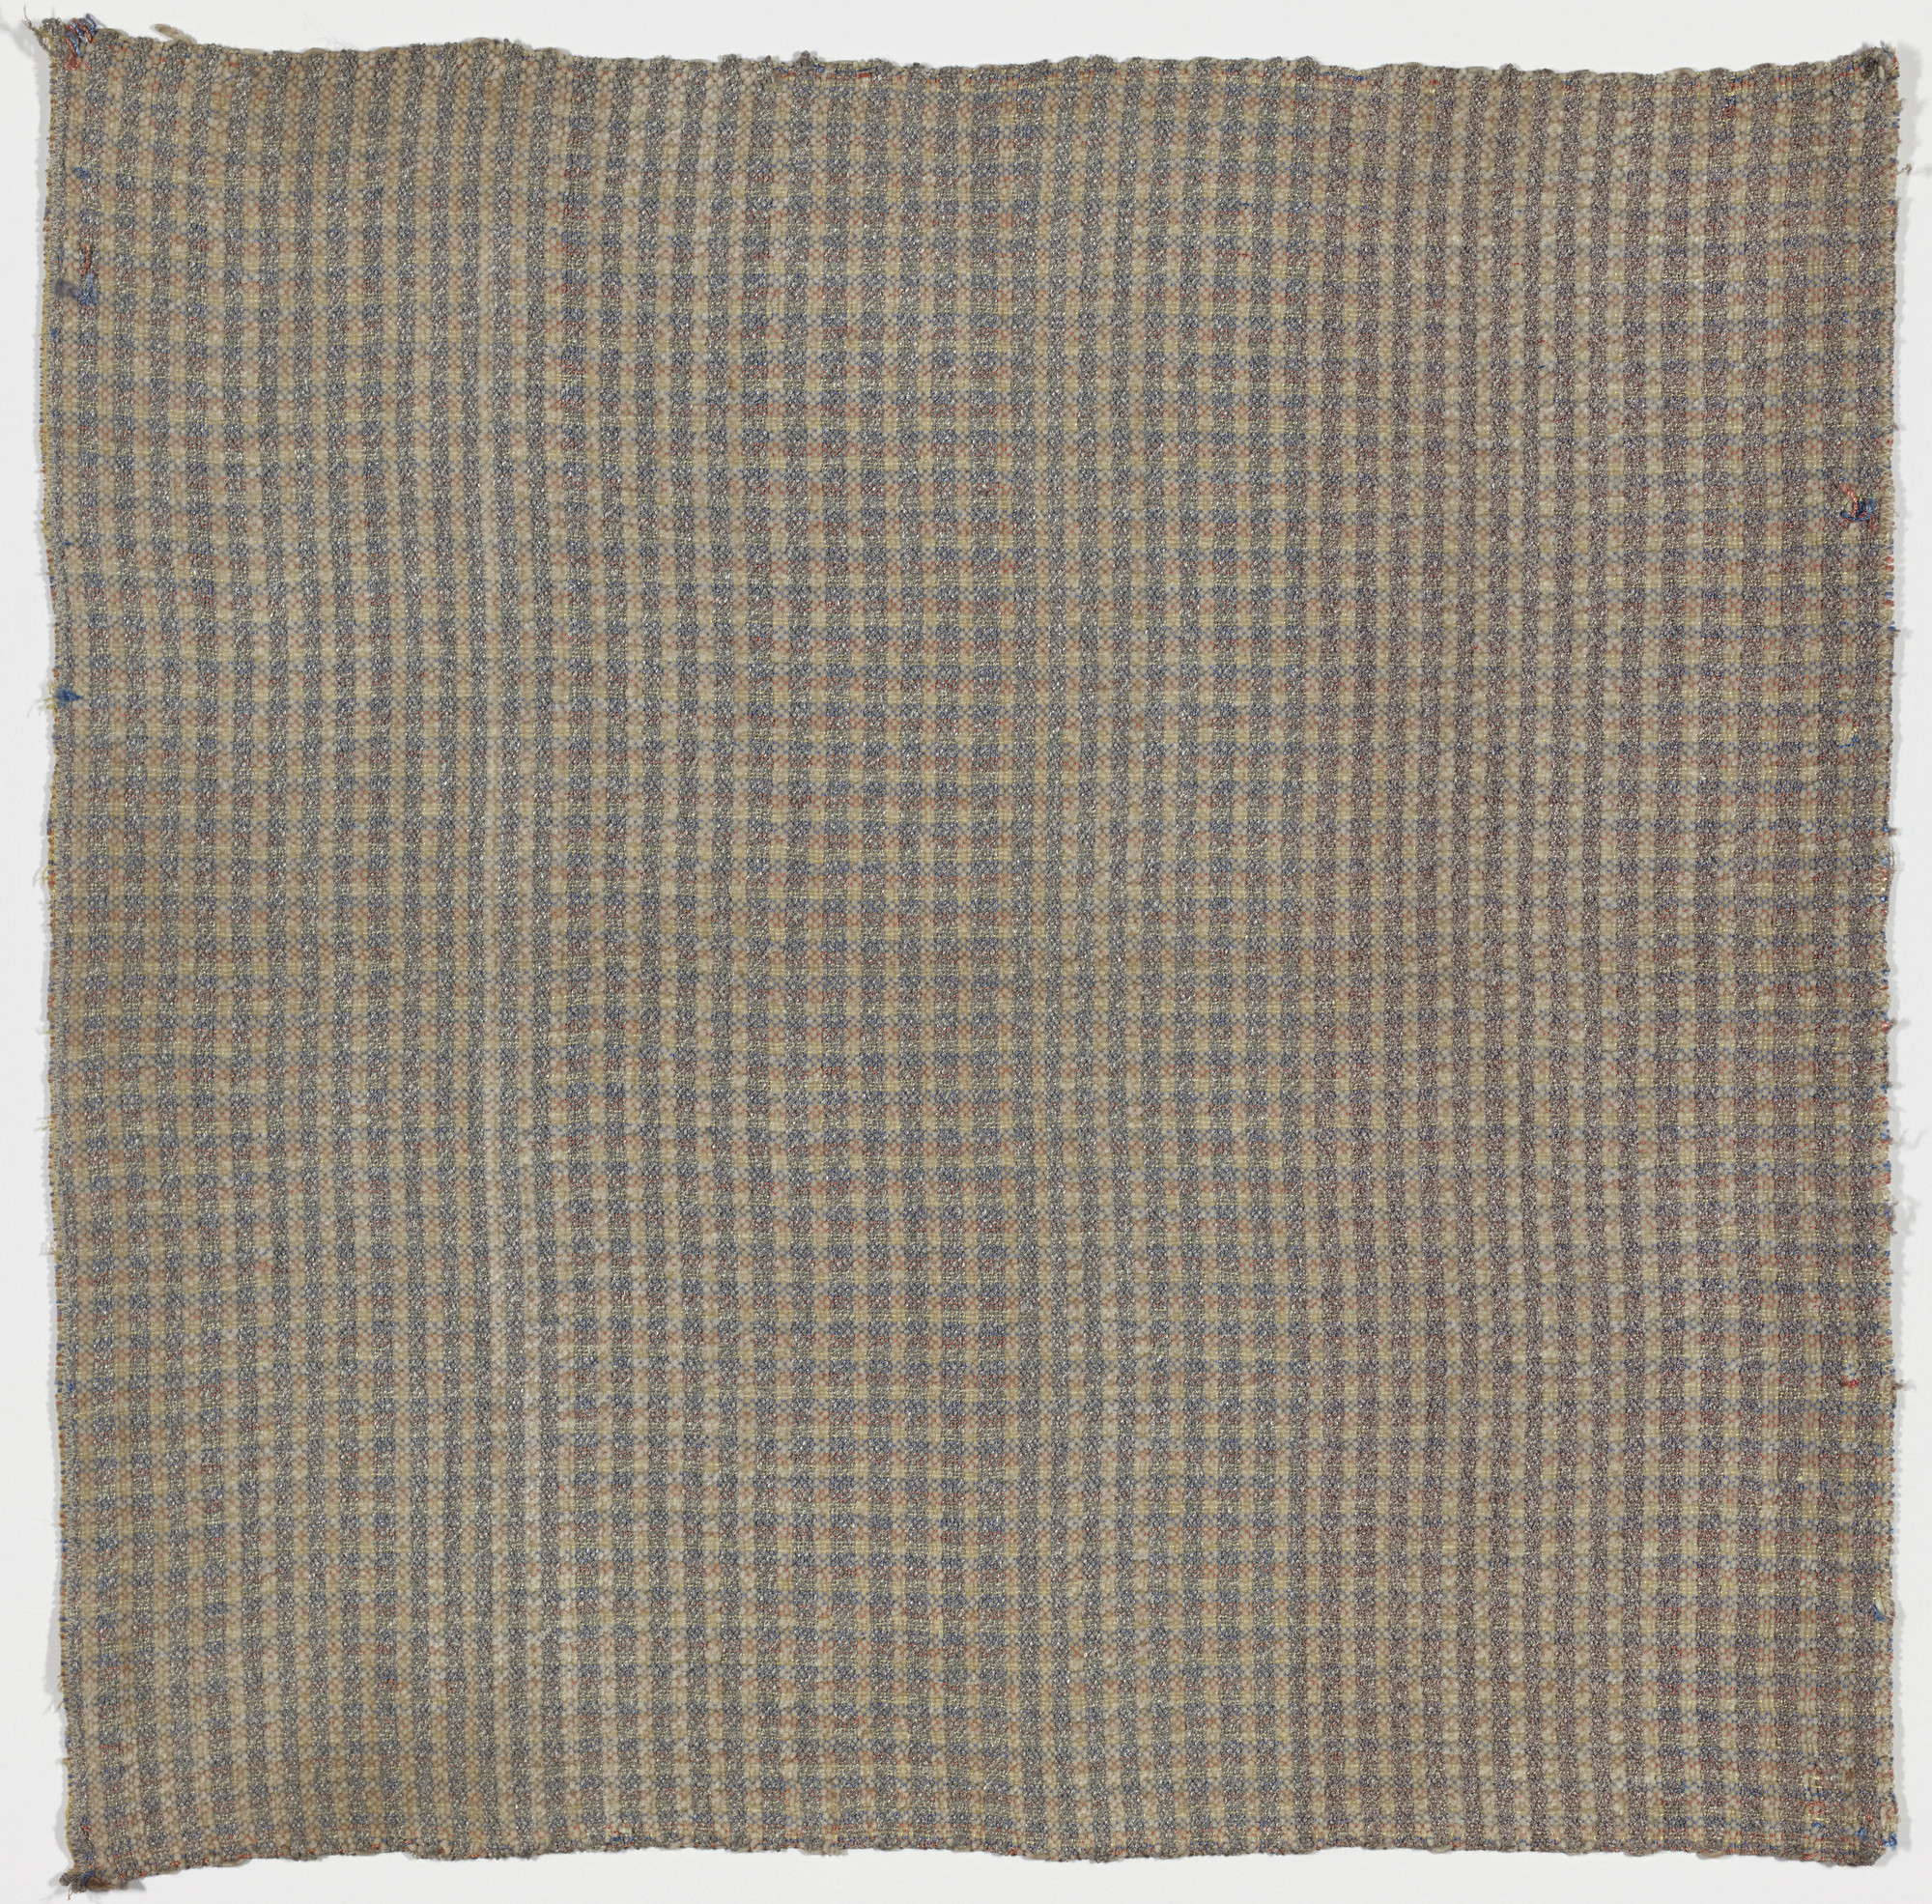 Marli Ehrman Upholstery Fabric Sample